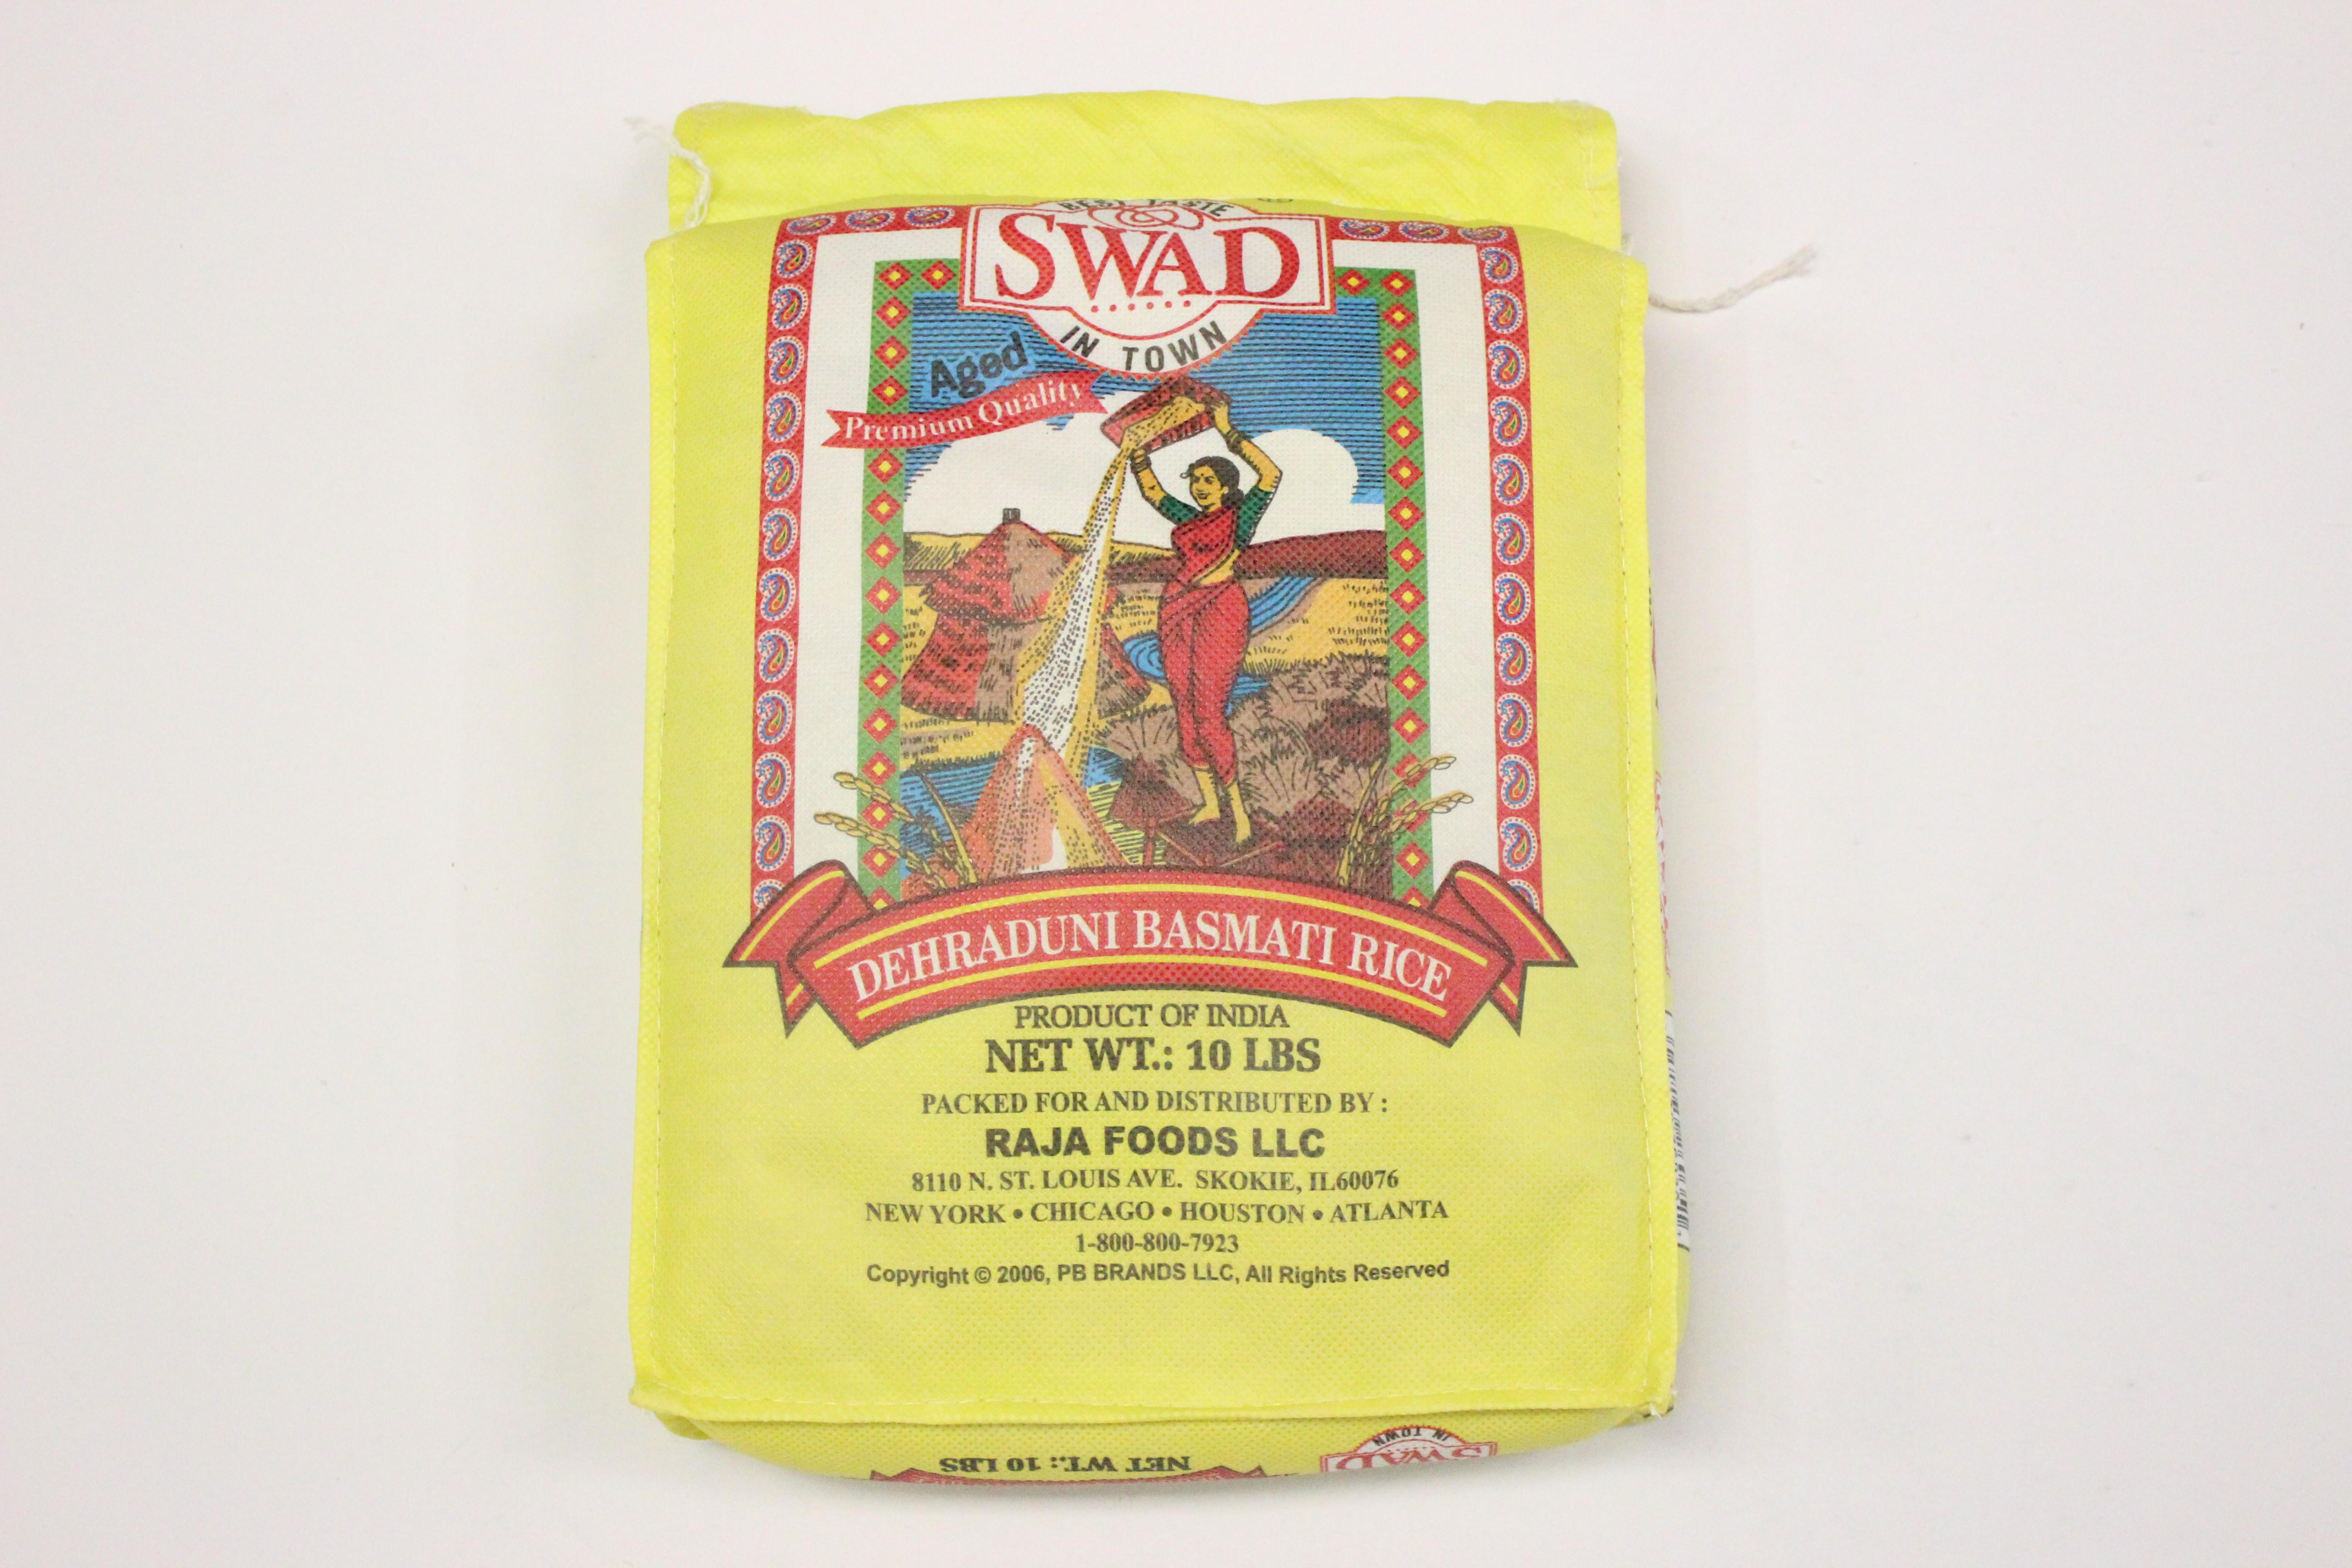 Swad Basmati Rice 10lb